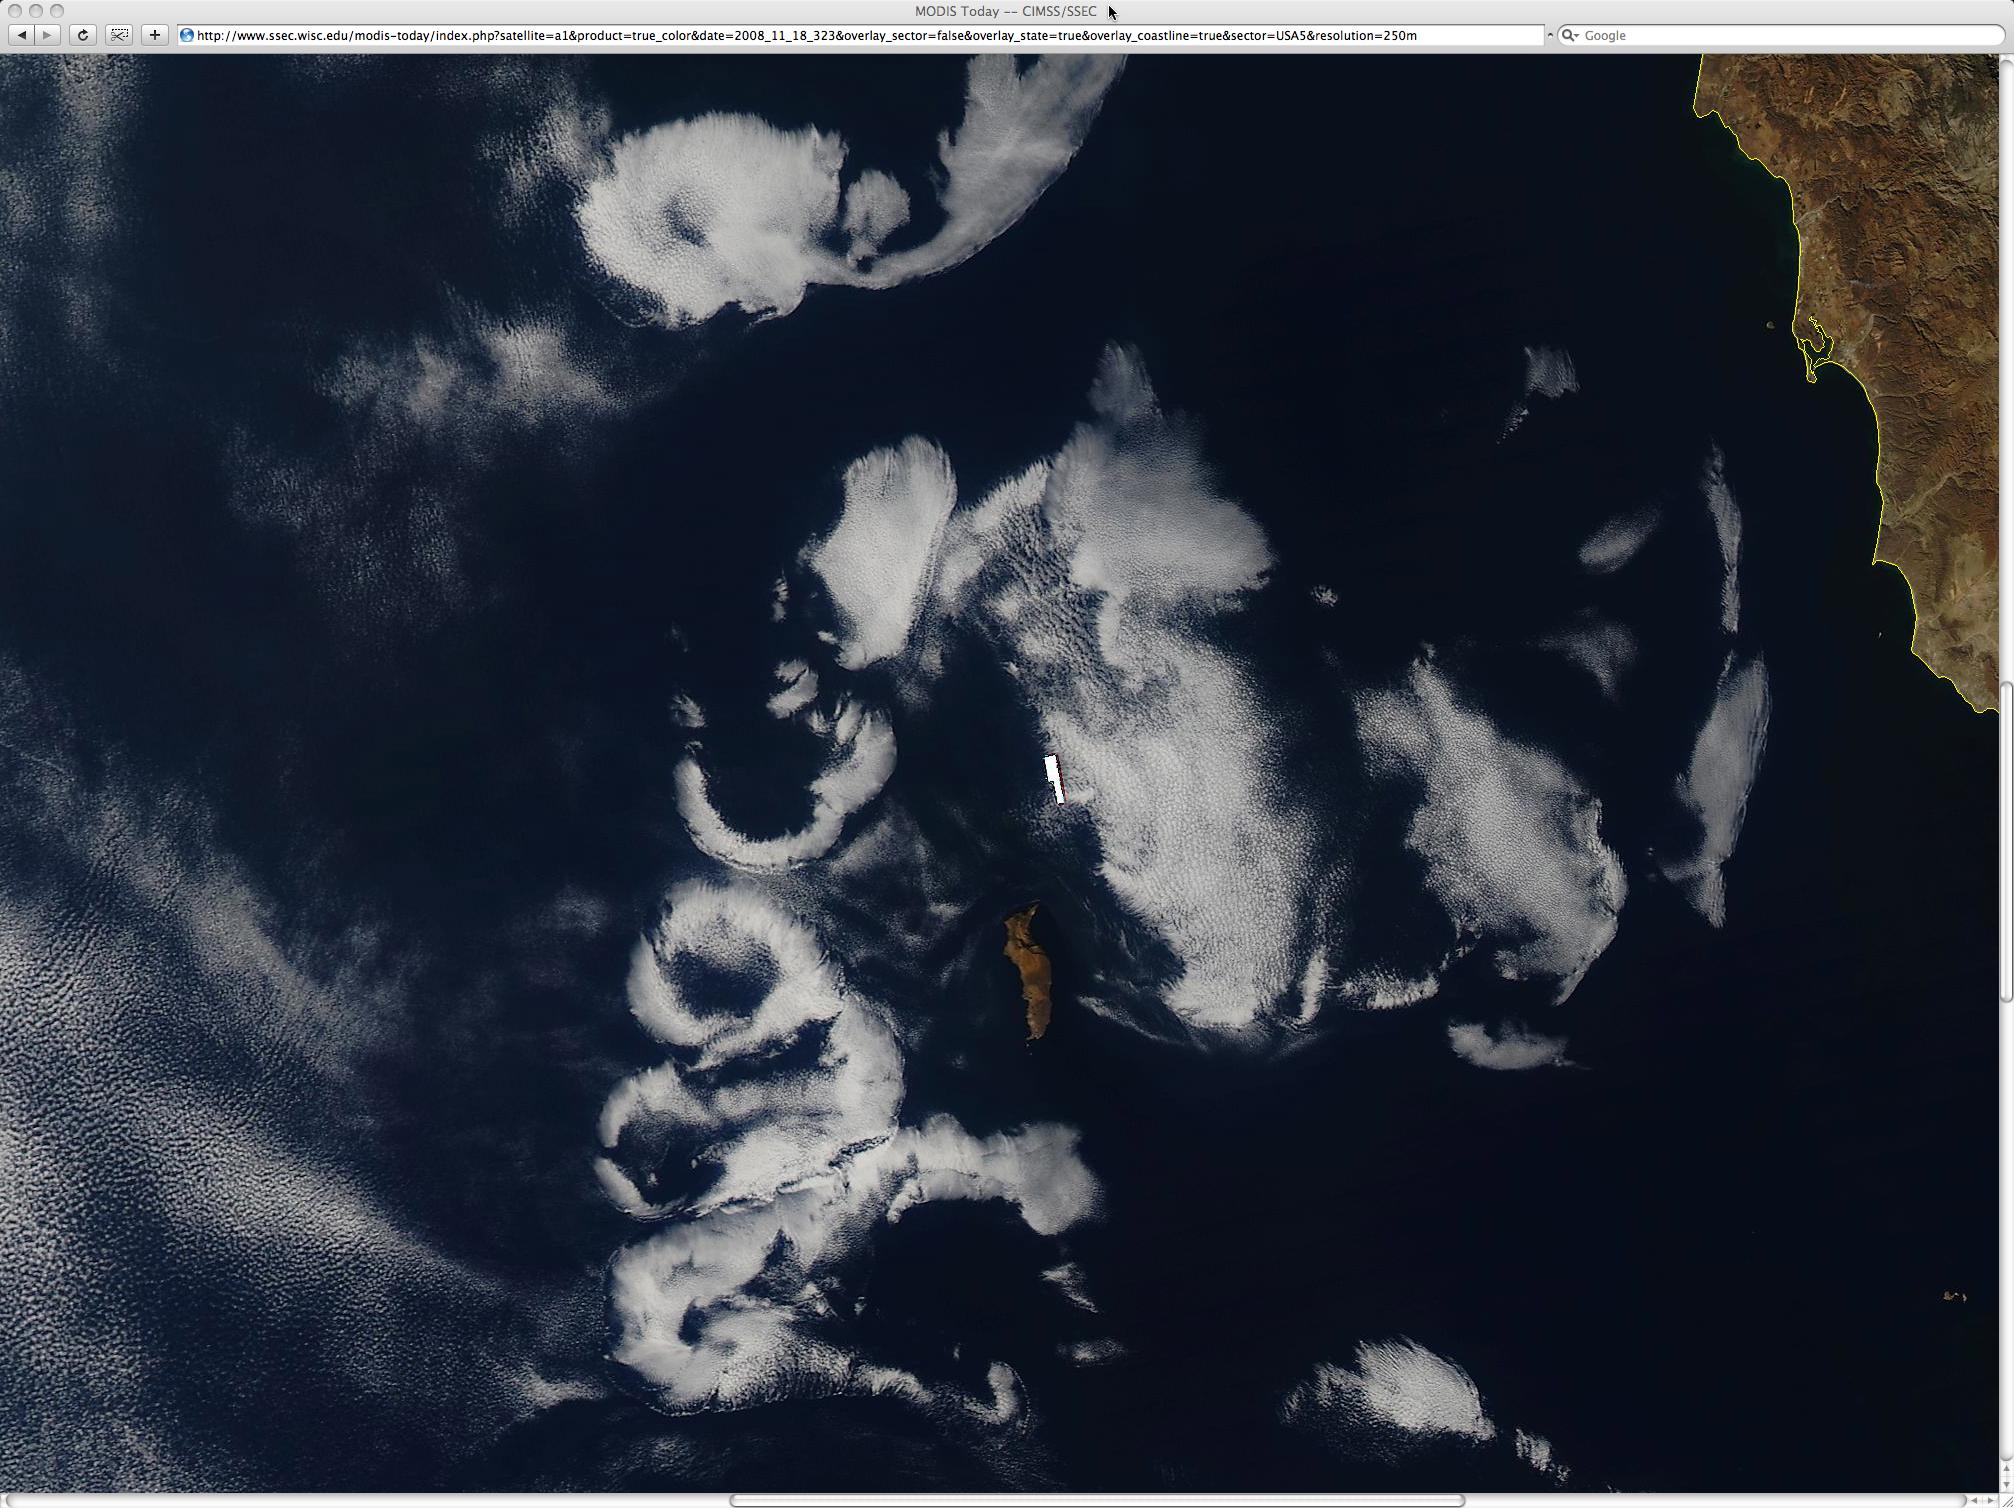 250-m resolution MODIS true color image